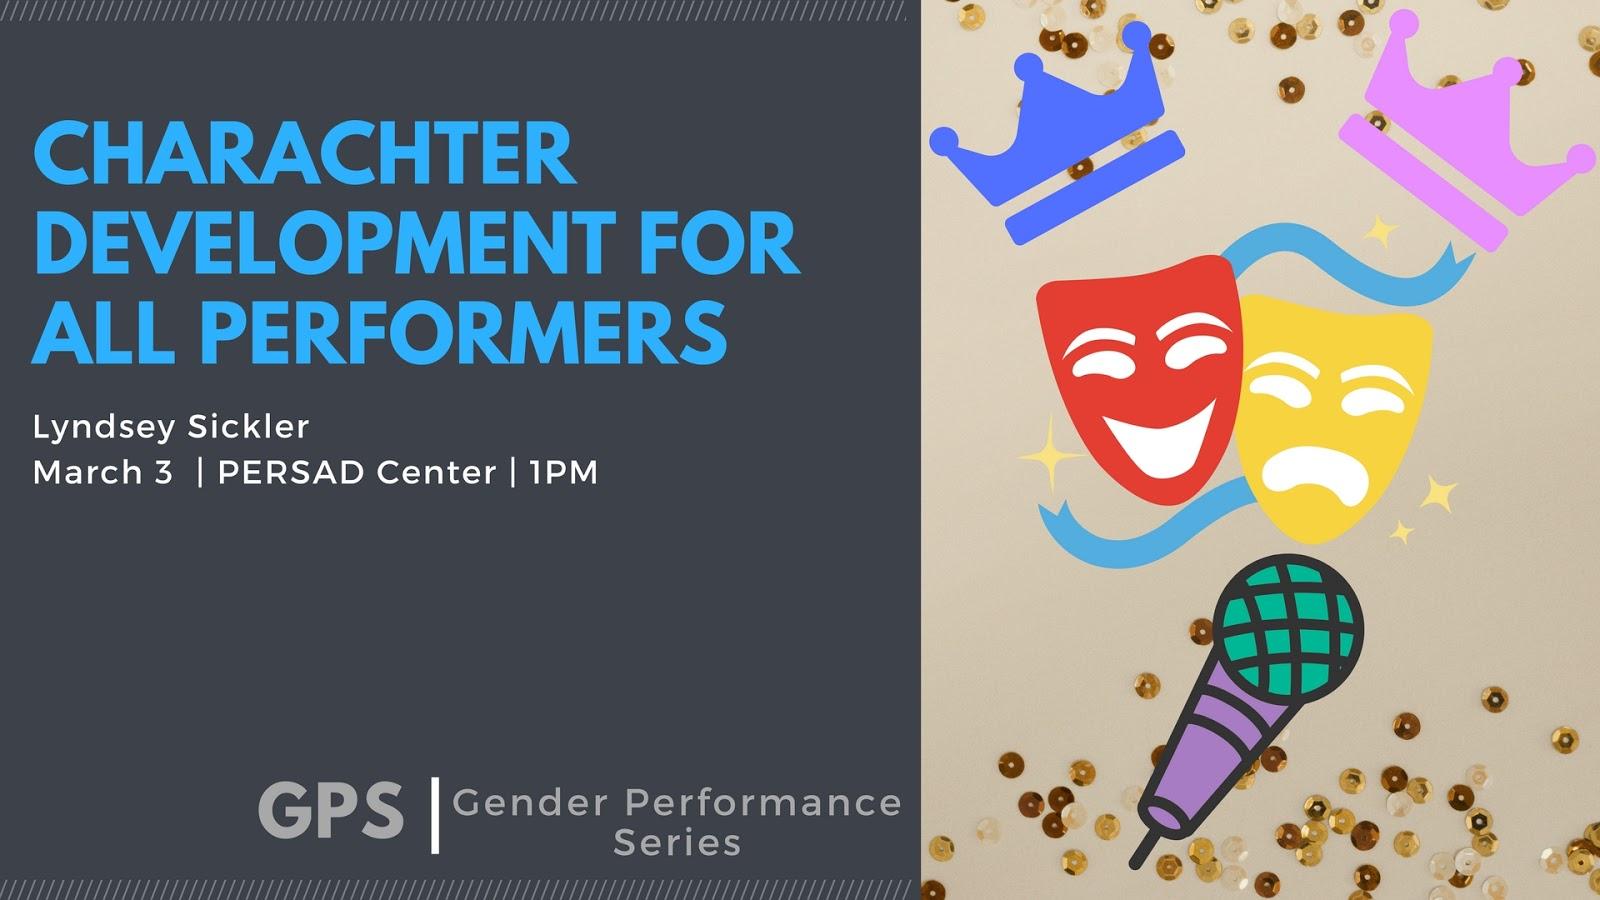 Gender in performance show strip